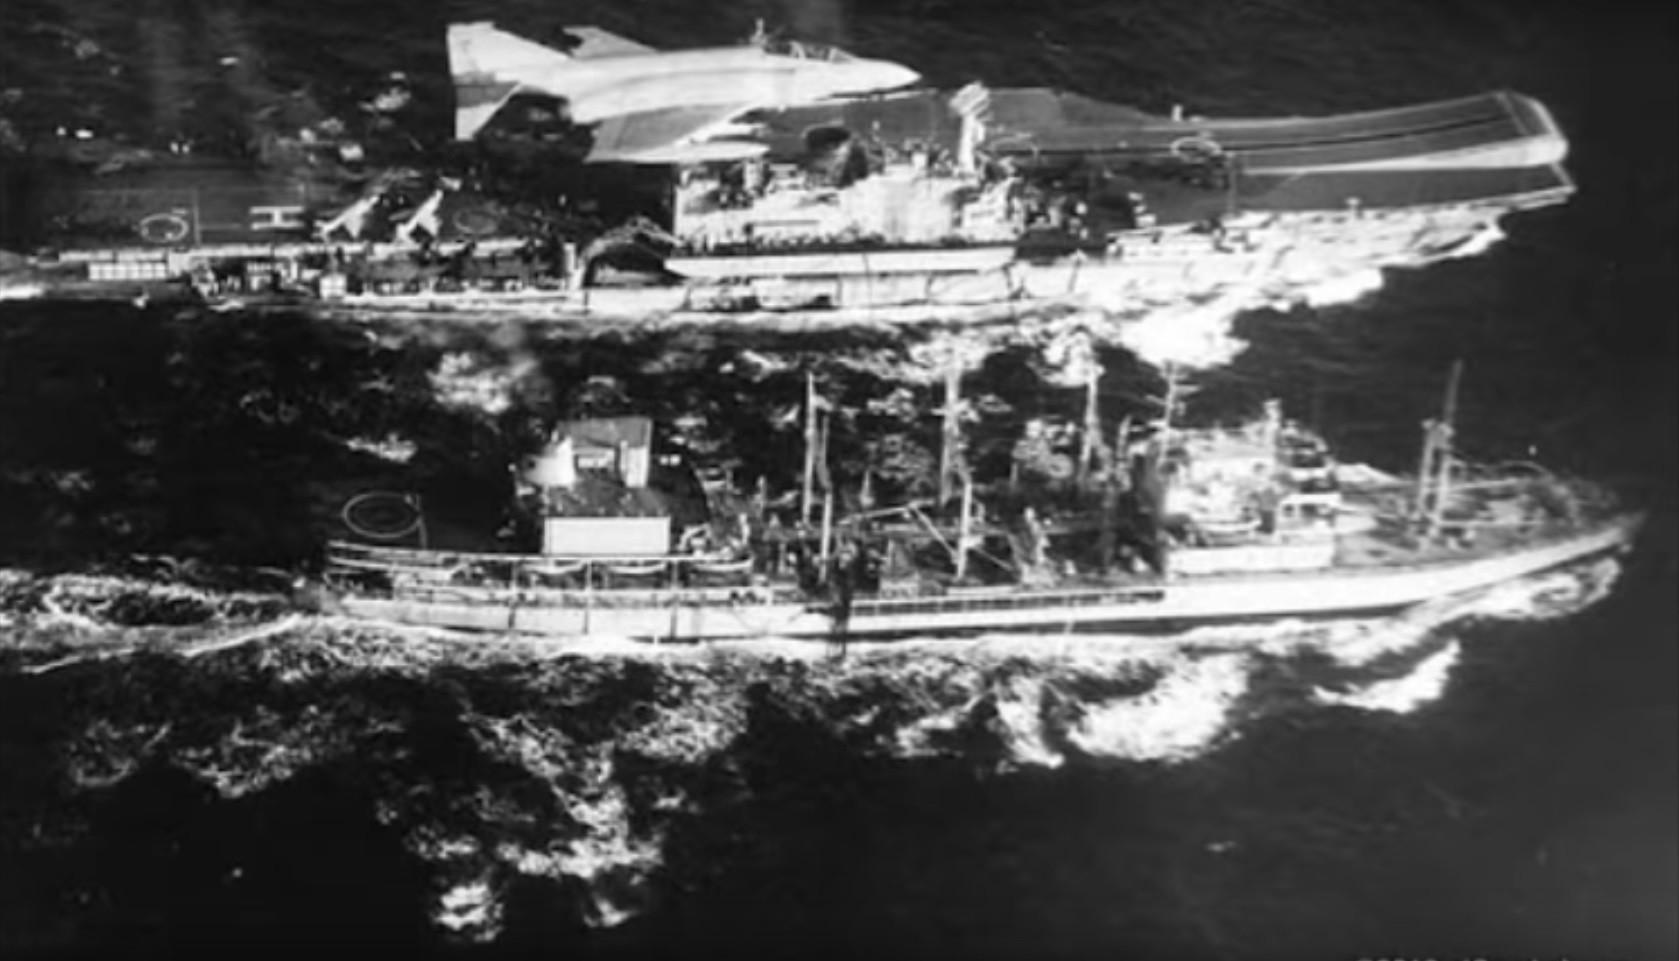 Nosač zrakoplova HMS Hermes i transportni brod Tidespring RFA snimljeni s Tu-95 pukovnika Bulbenkova.